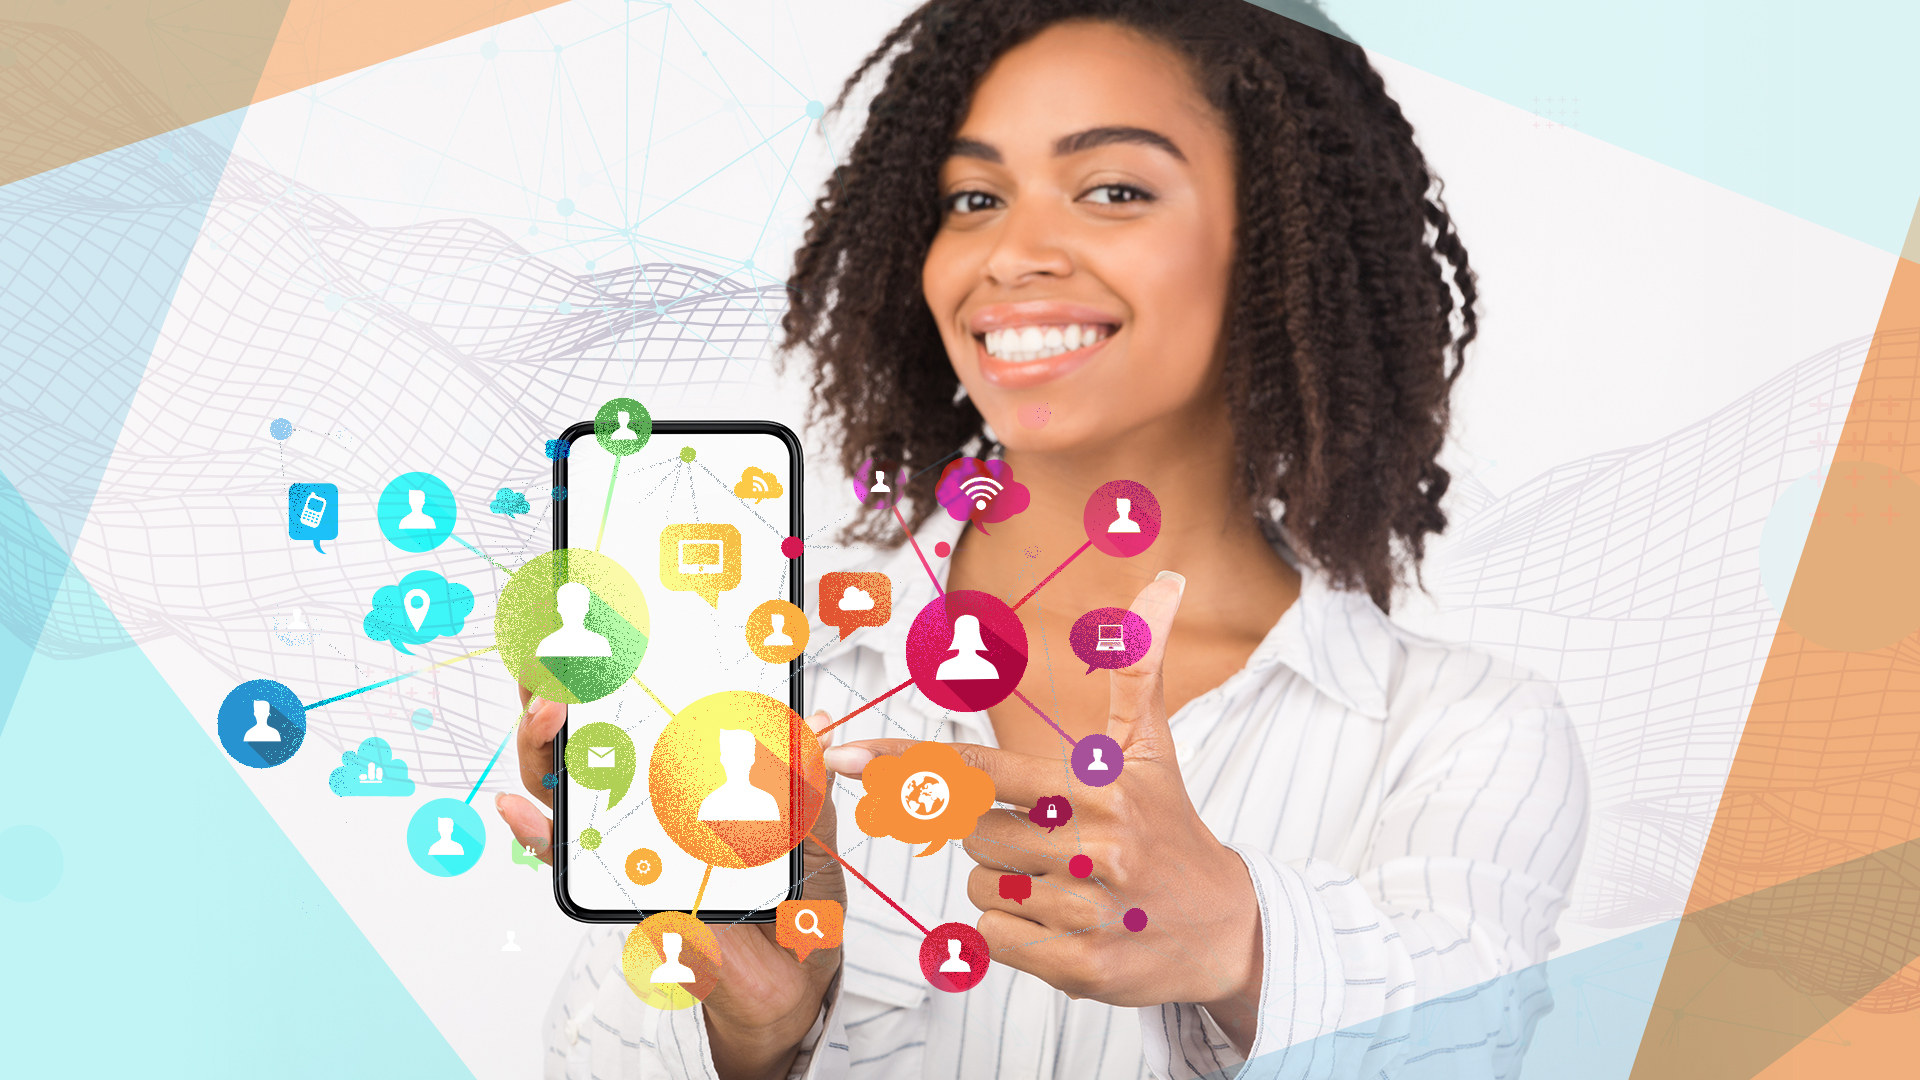 Smartphone, Smartphones, Mobilfunk, Social Network, Messenger, Handy, soziales Netzwerk, Chat, Kommunikation, Instant Messaging, Telefonie, Telefon, Telekommunikation, Telefonieren, Kontakte, Frau, Netzwek